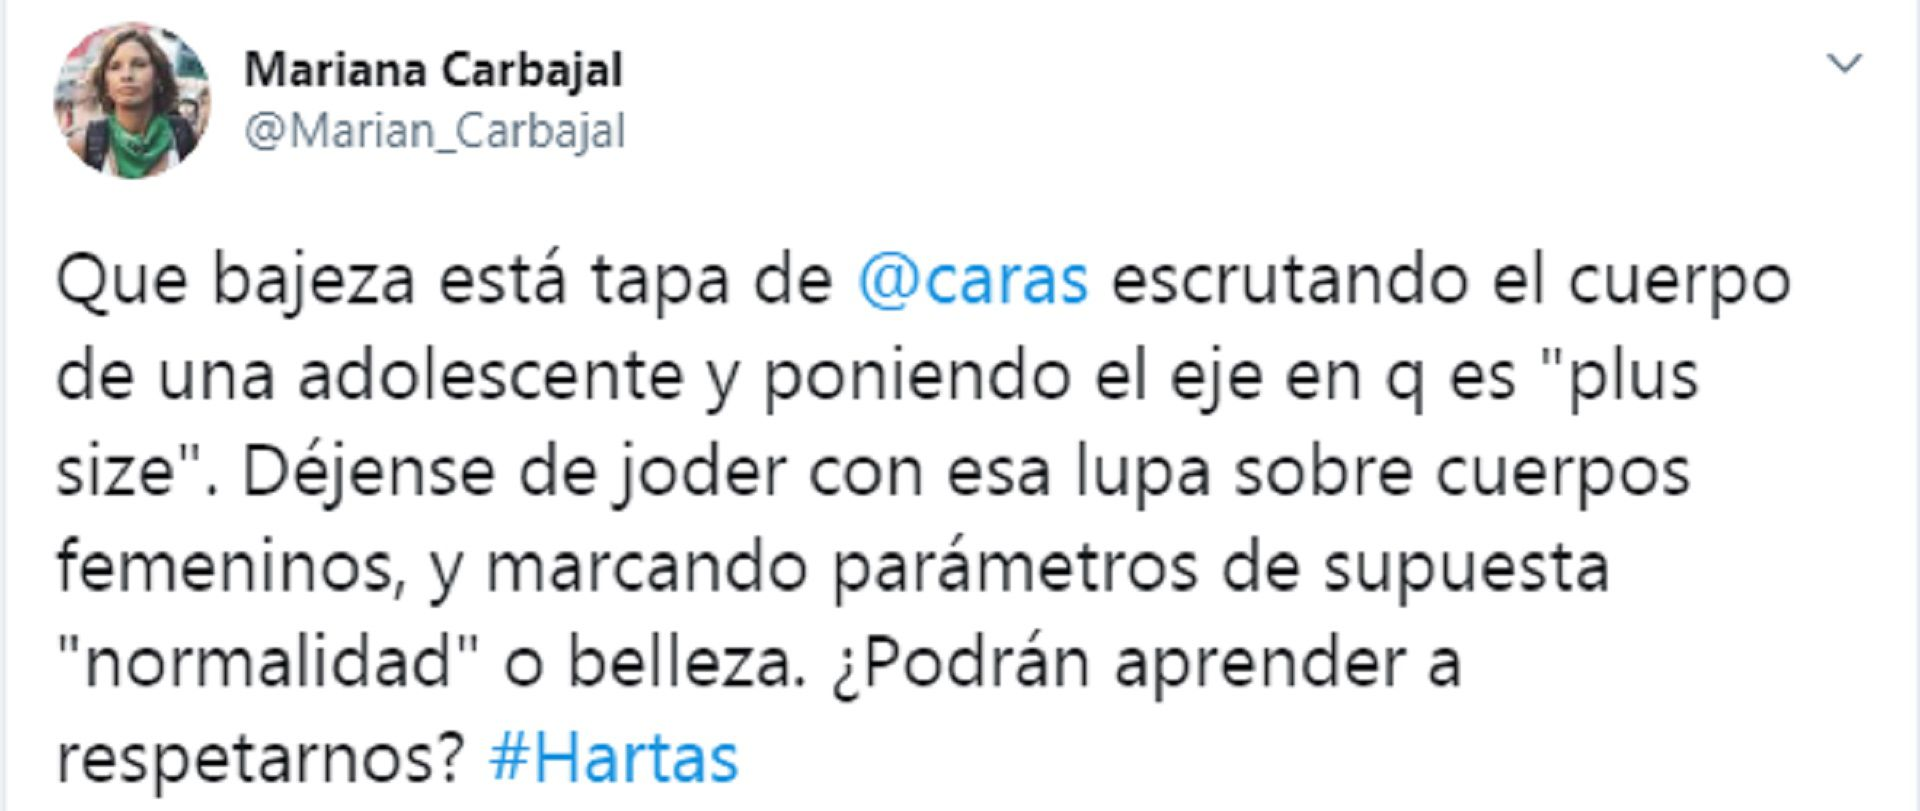 criticas revista caras hija maxima